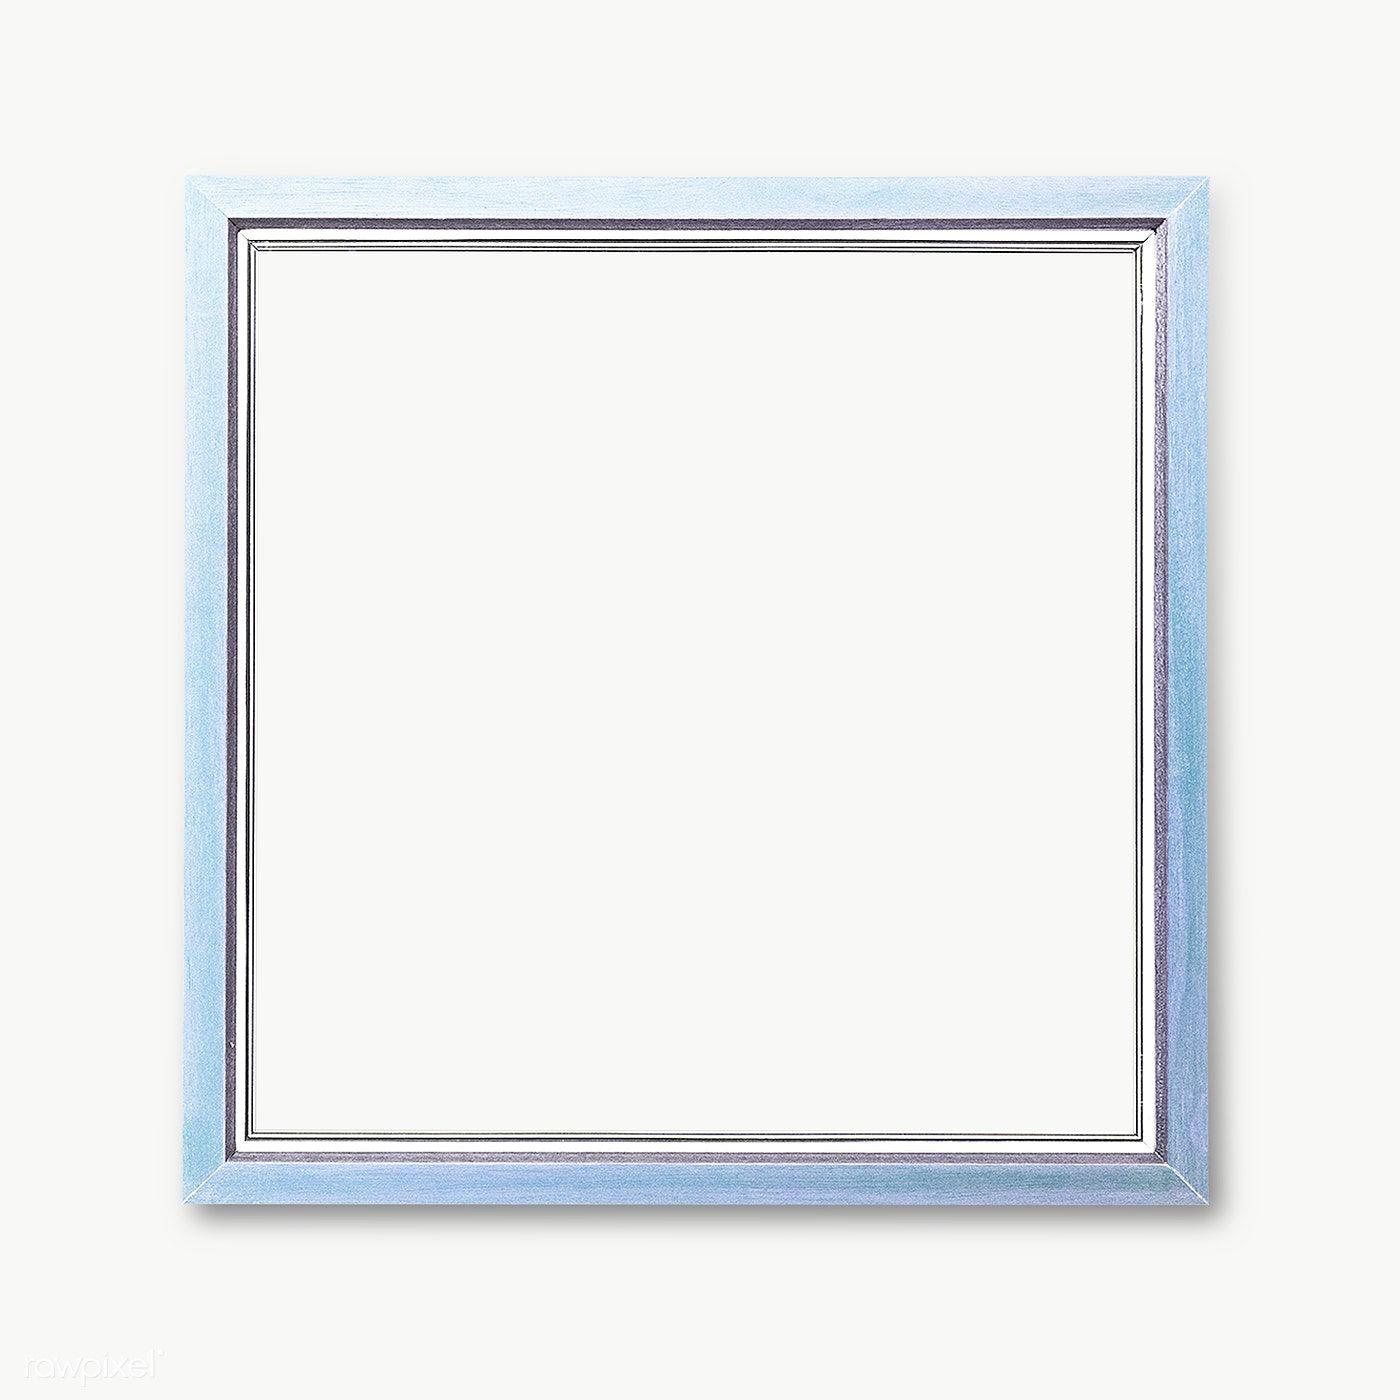 Light Blue Photo Frame Mockup Premium Image By Rawpixel Com Ployploy Frame Frame Mockups White Photo Frames